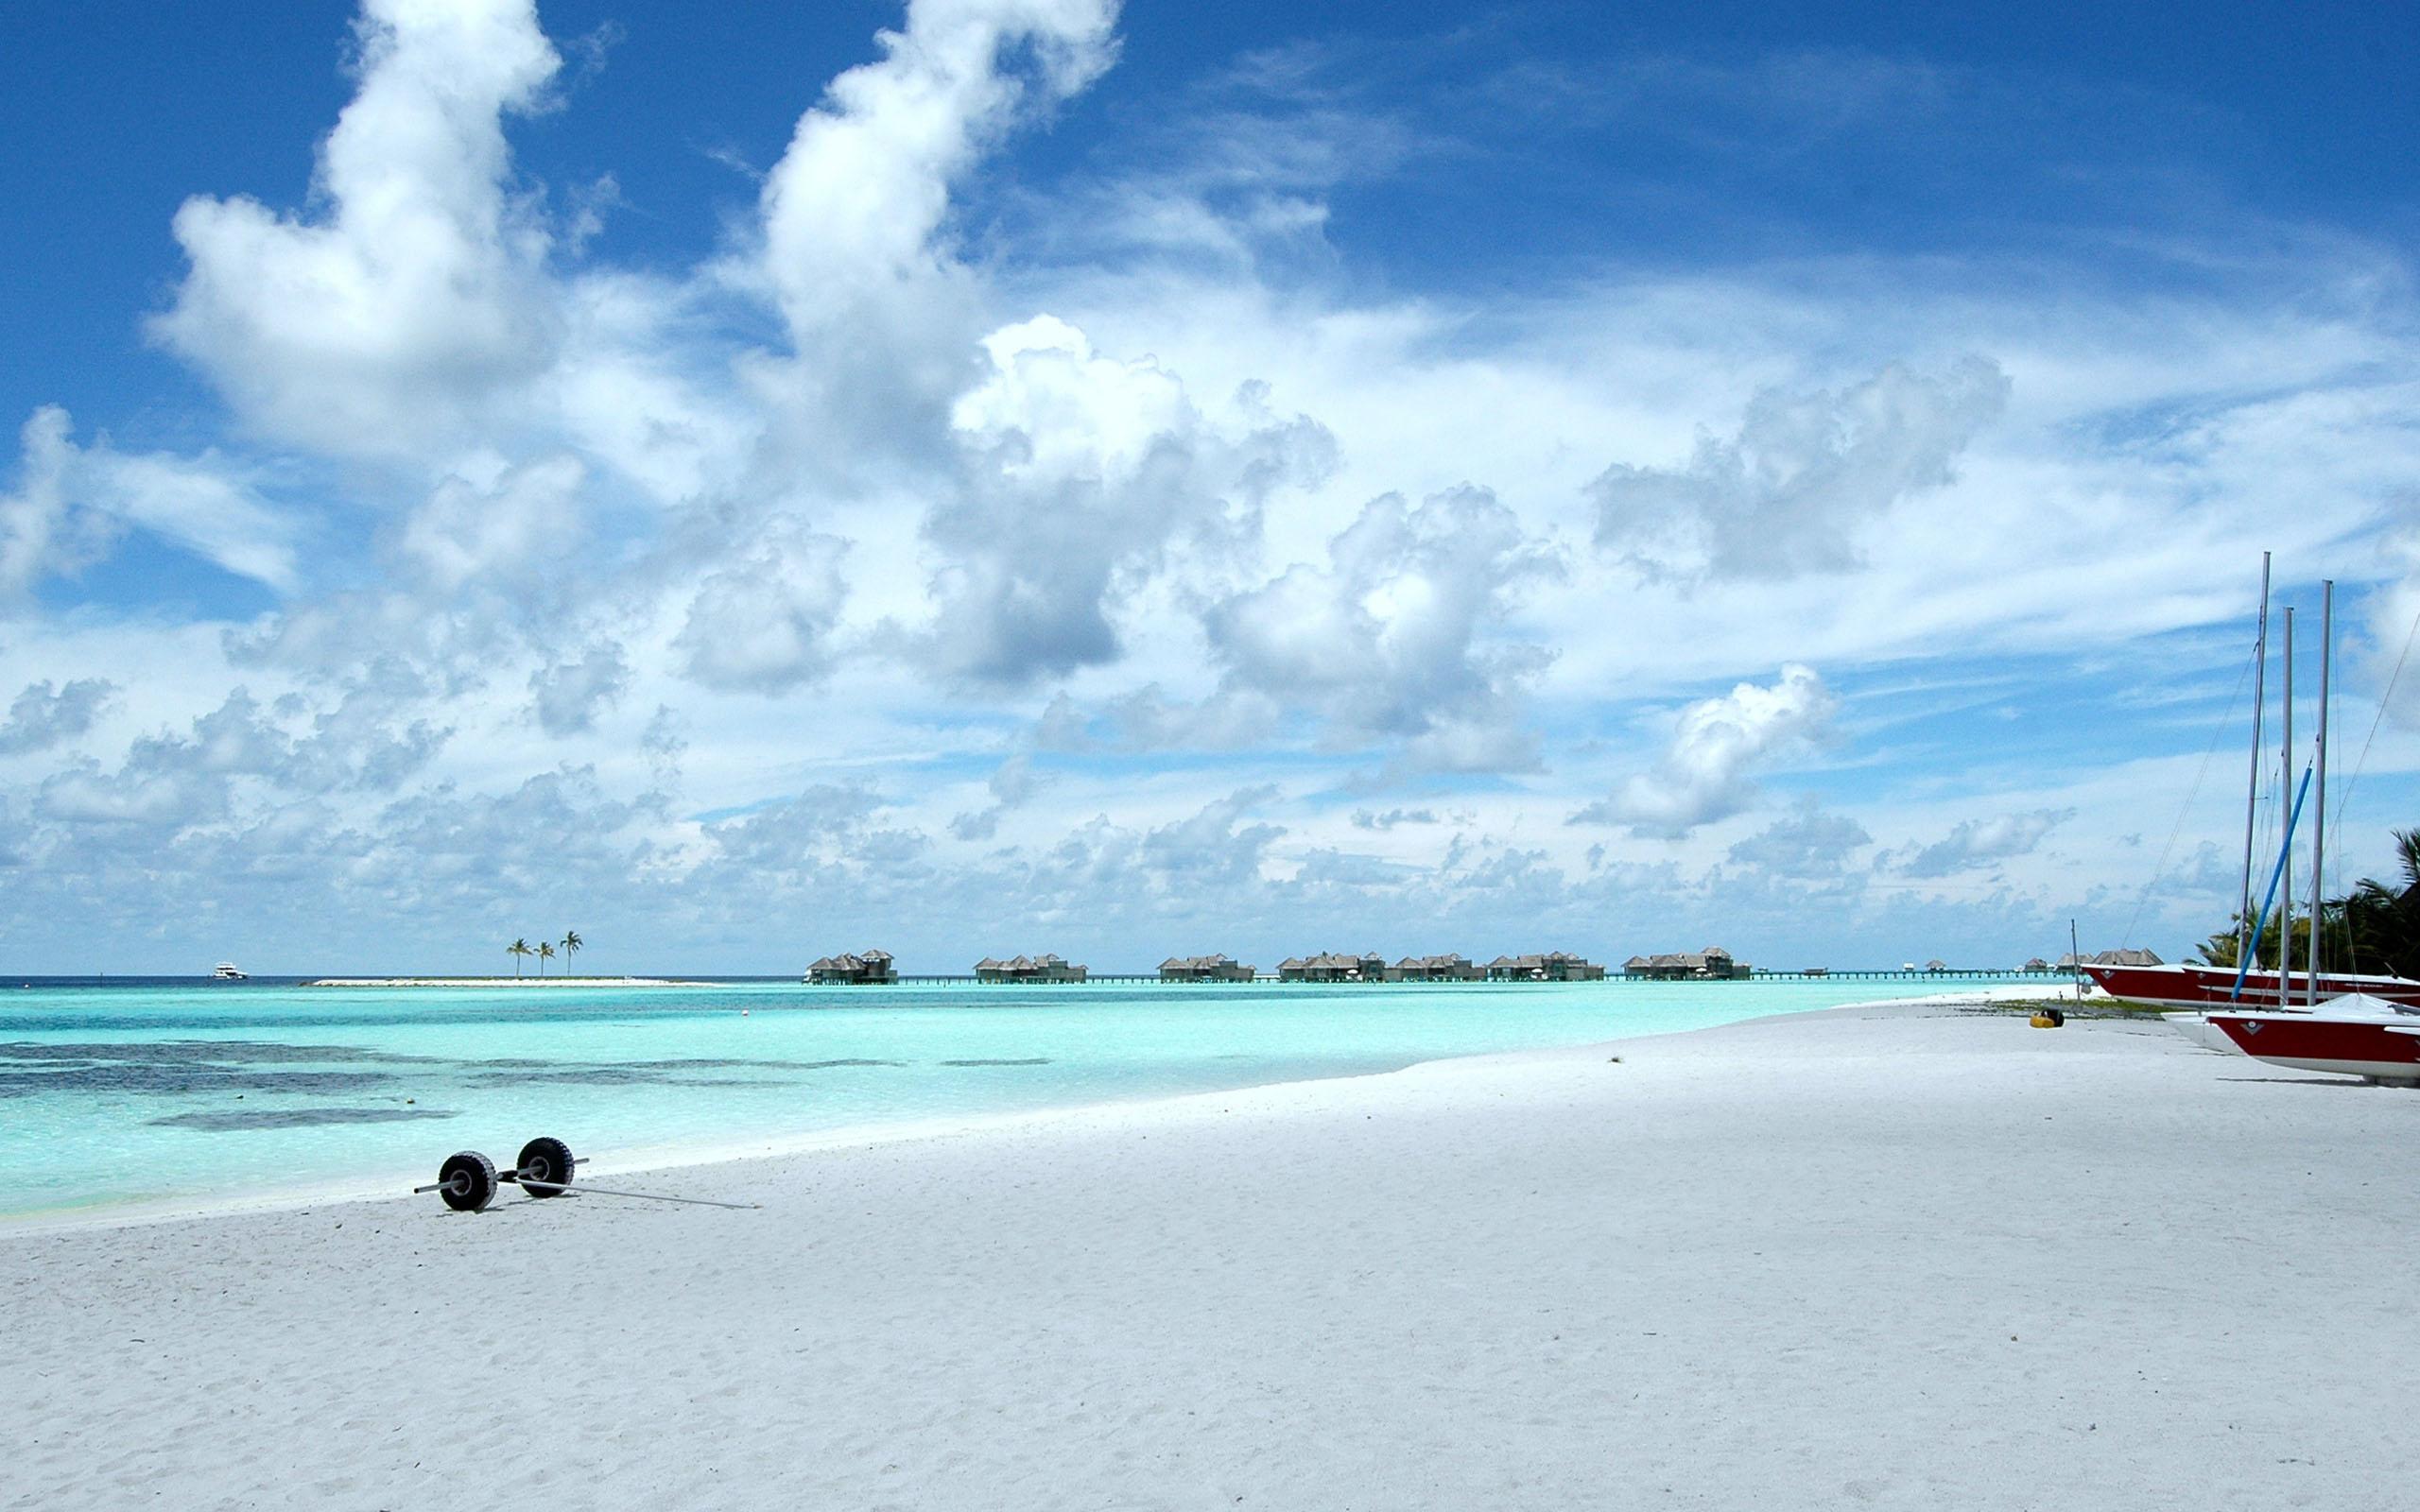 Hd wallpaper travel - Travel To Maldives Hd Wallpaper